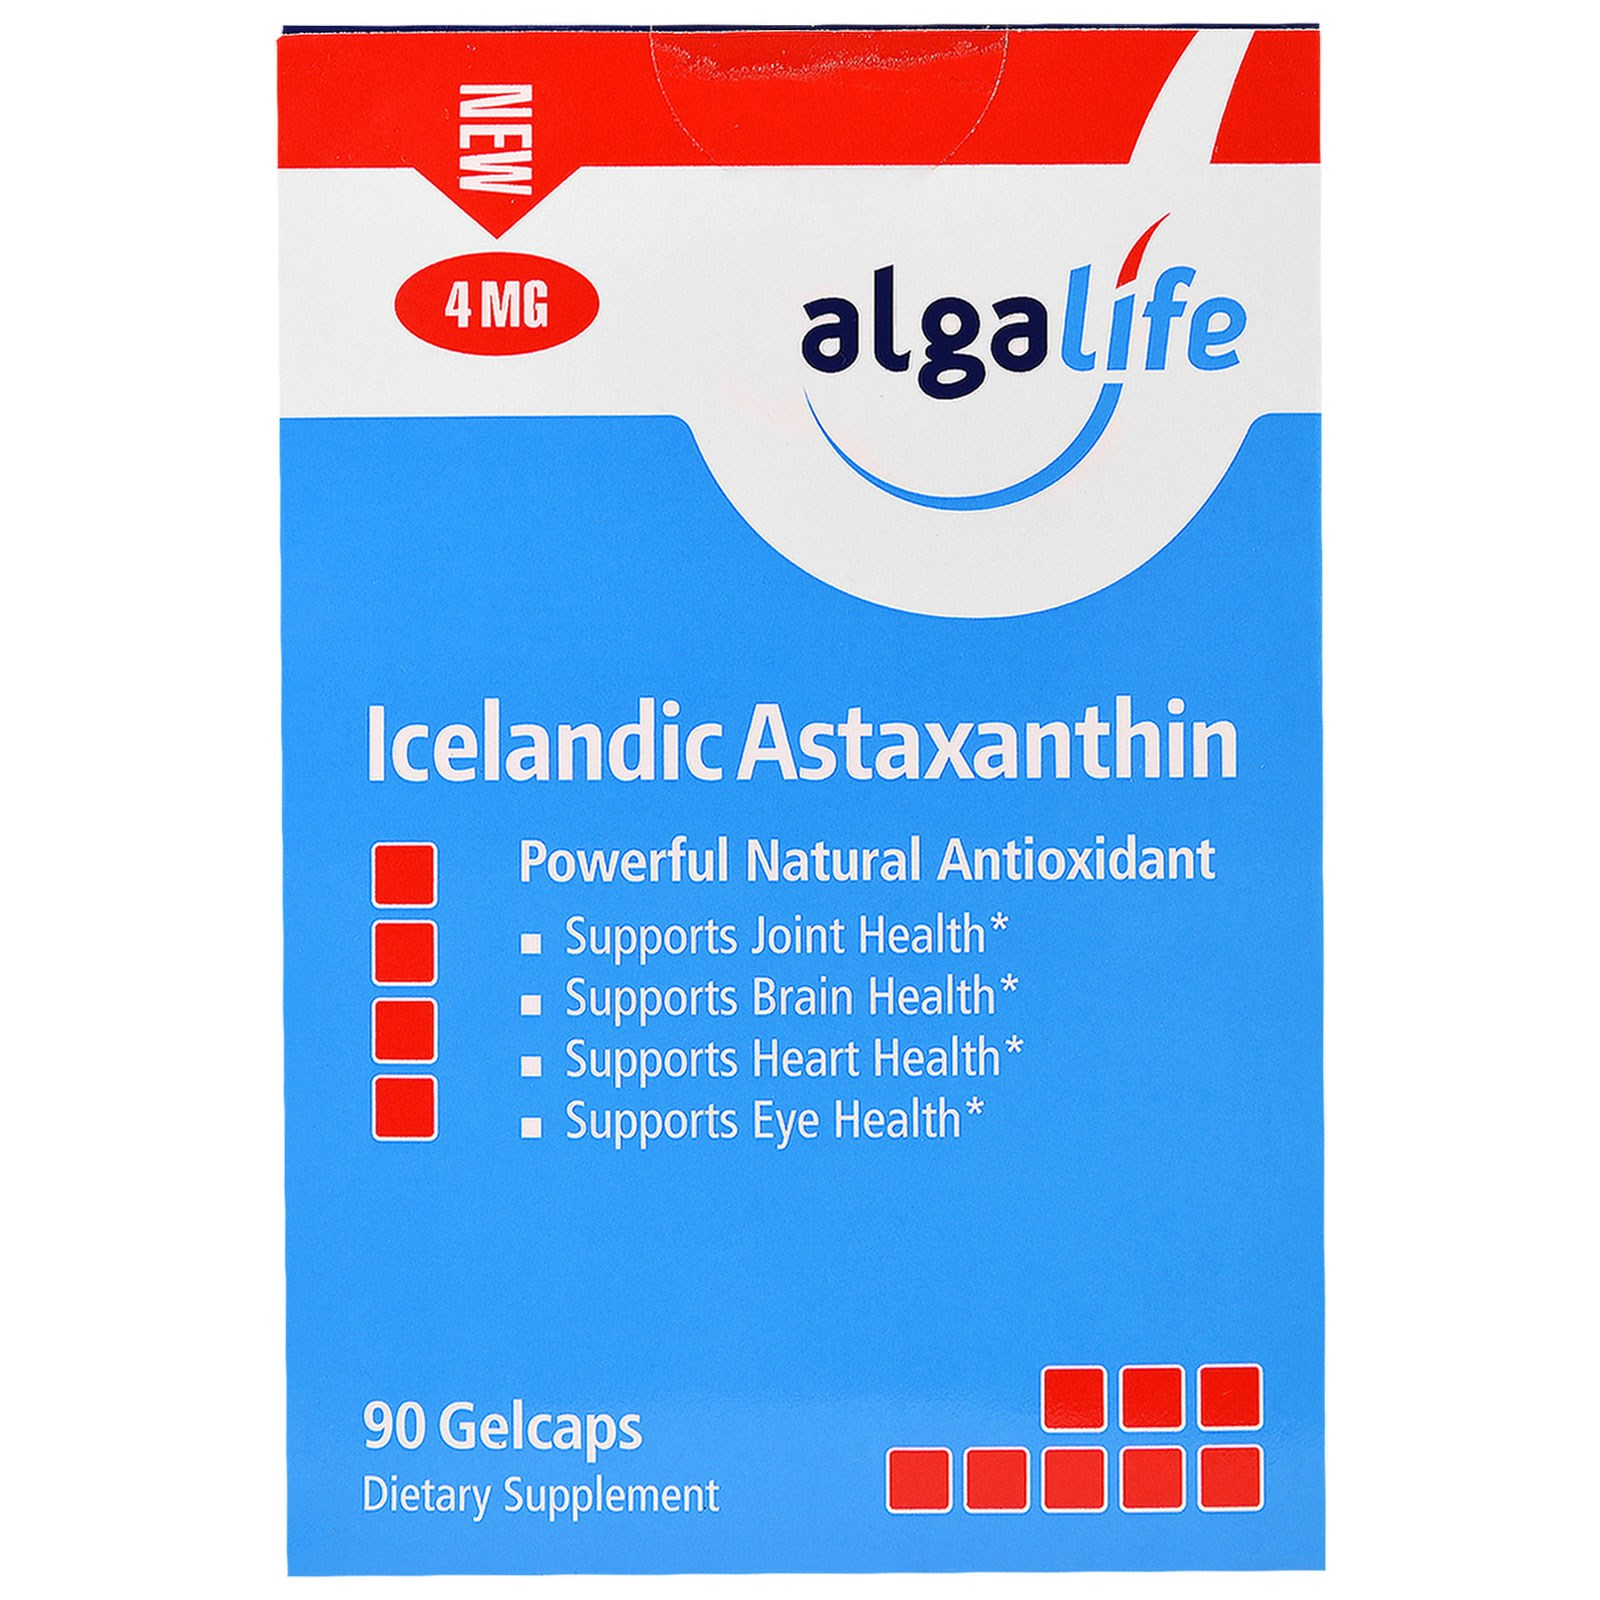 Algalife, Icelandic Astaxanthin, 4mg, 90 Gelcaps